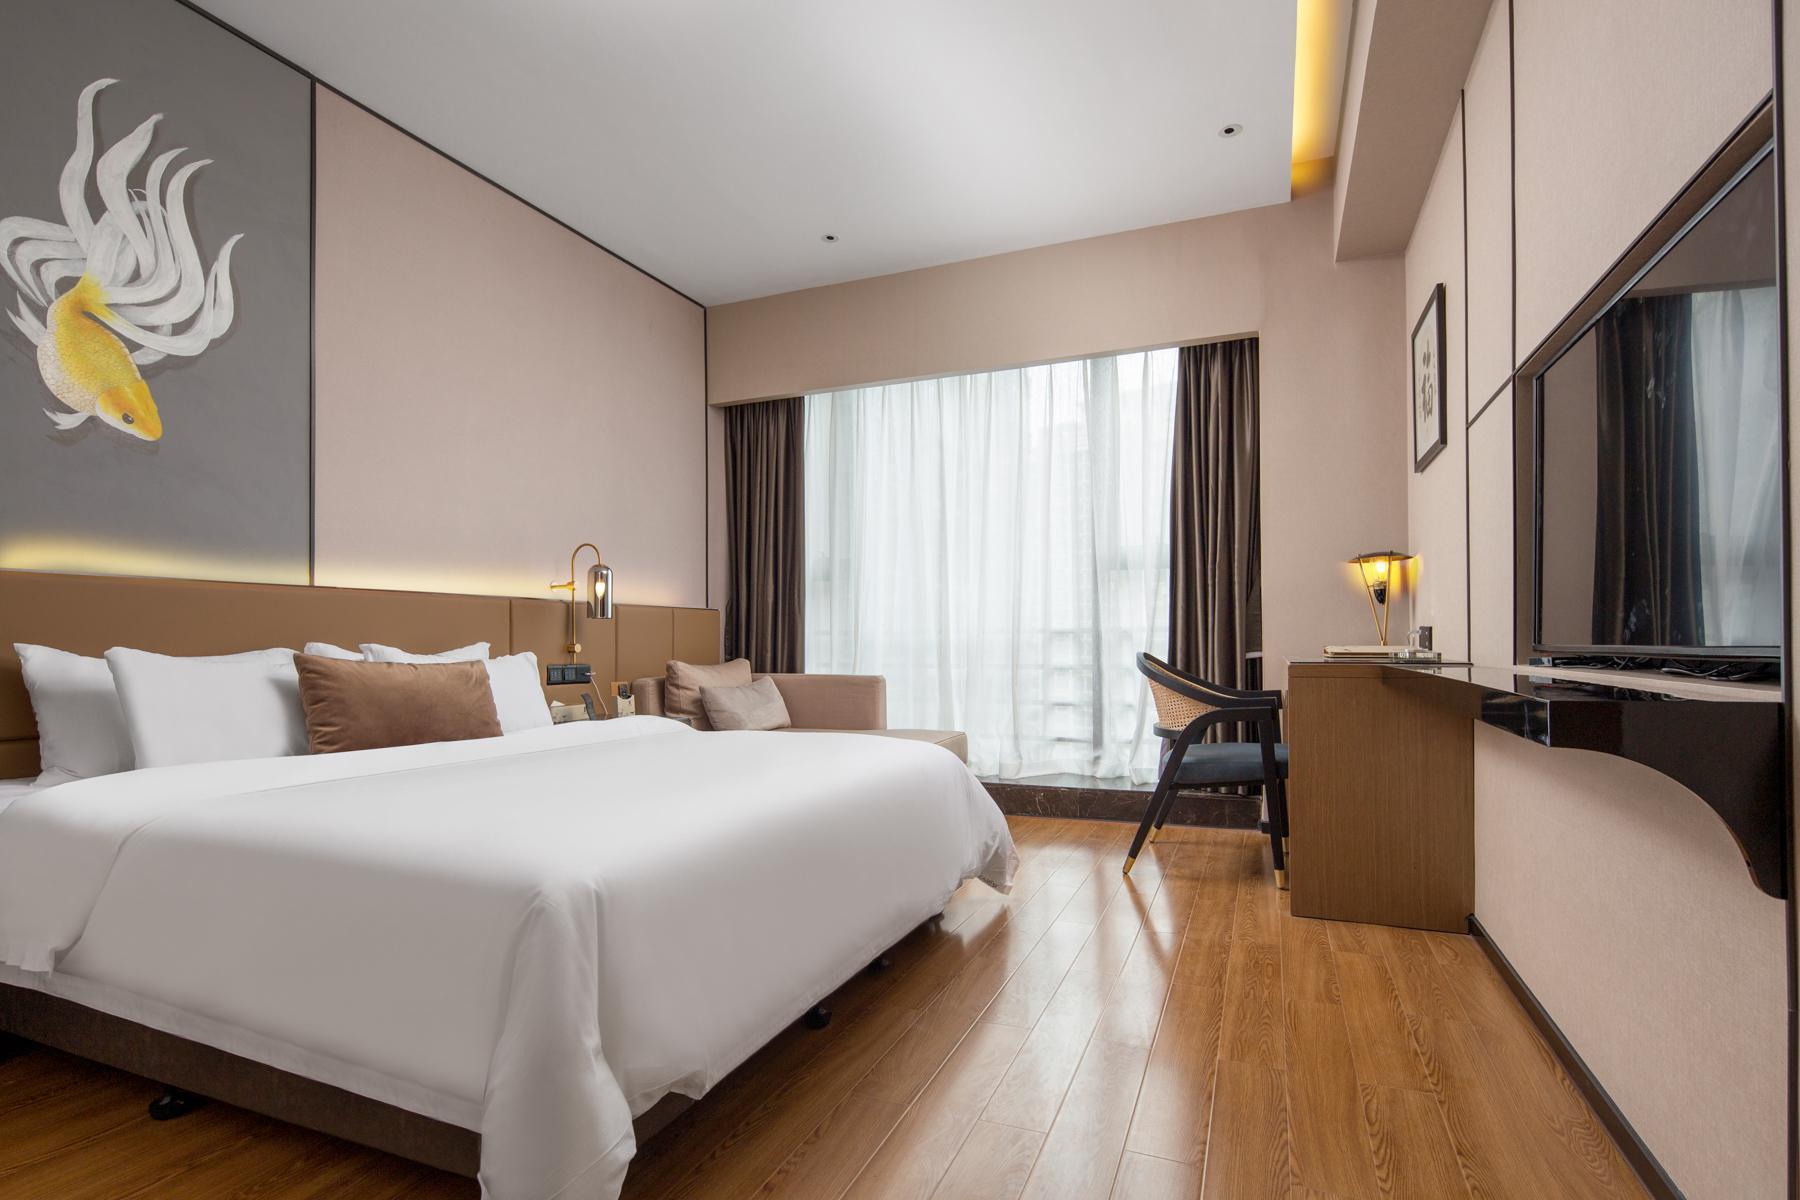 City View Big Bed Room